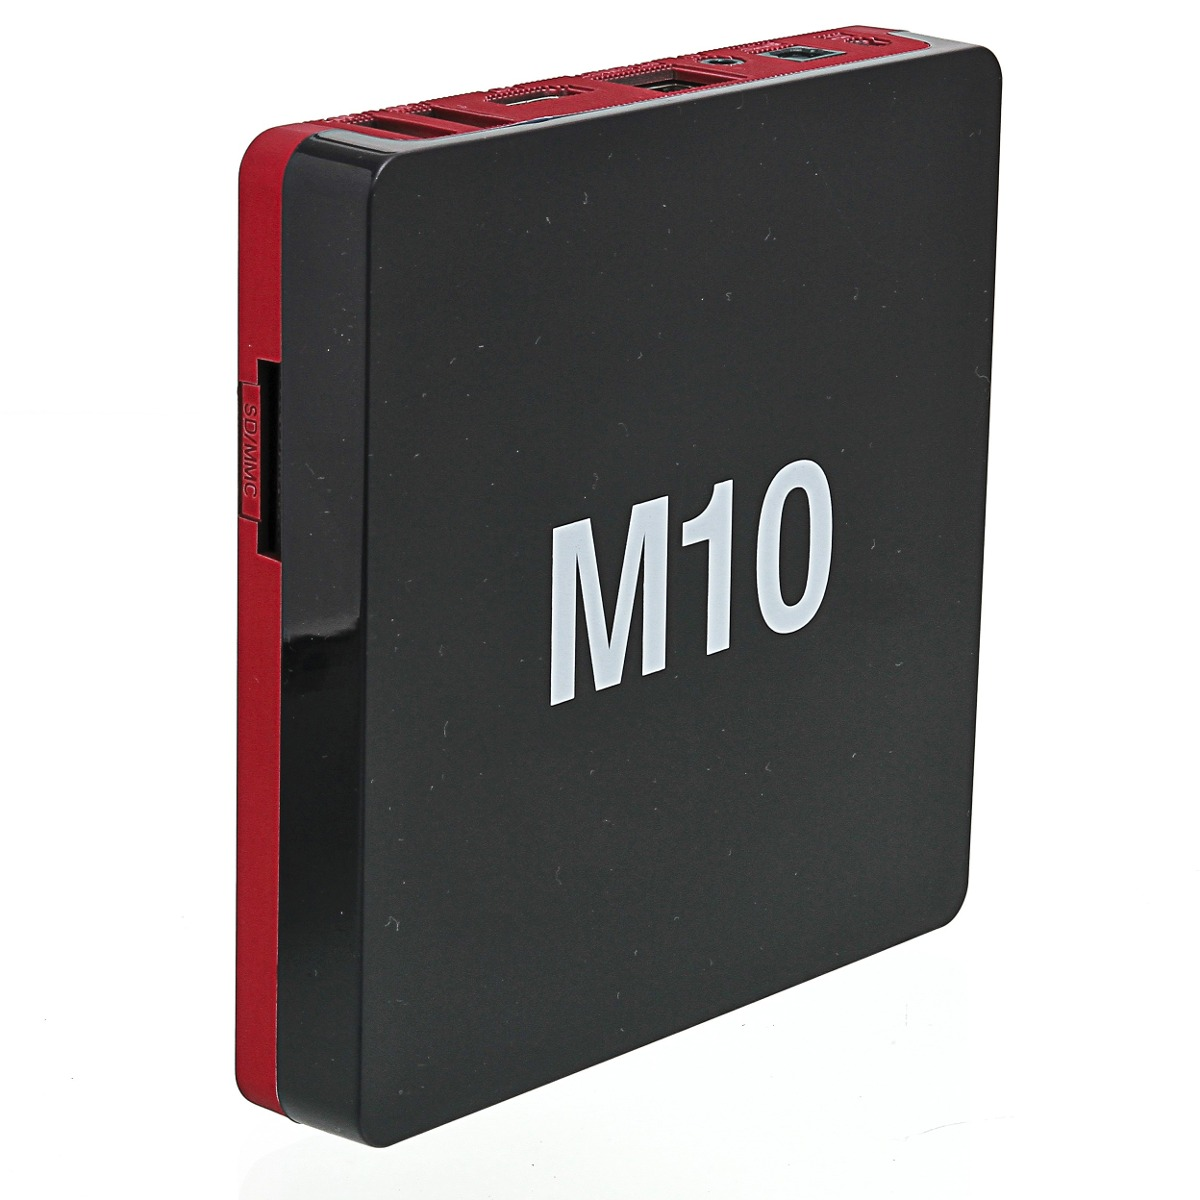 Tv Box Android 4.4 Tv Modelo M10 4k Gamer Netflix Quad Wifi Facebook Miracast Jogos Snes  - HARDFAST INFORMÁTICA